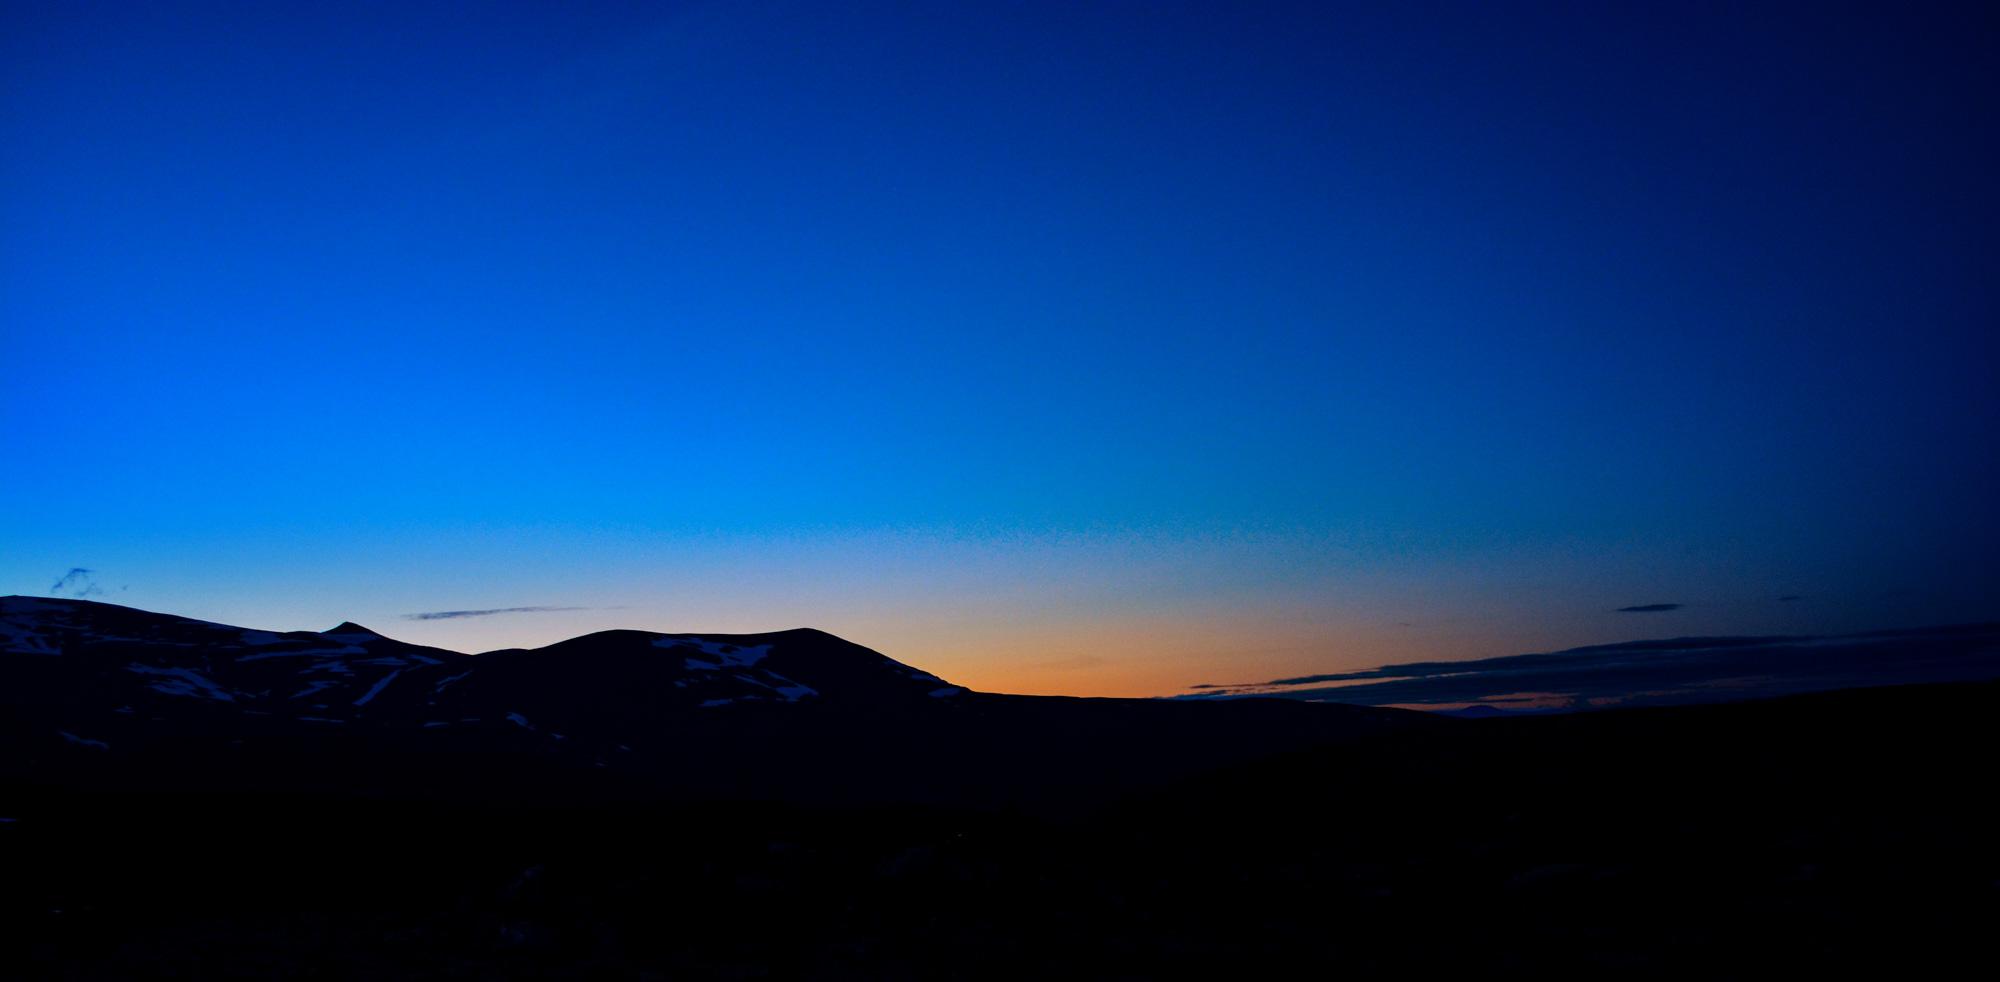 Solnedgång vid Besssvatnet i Jotunheimen